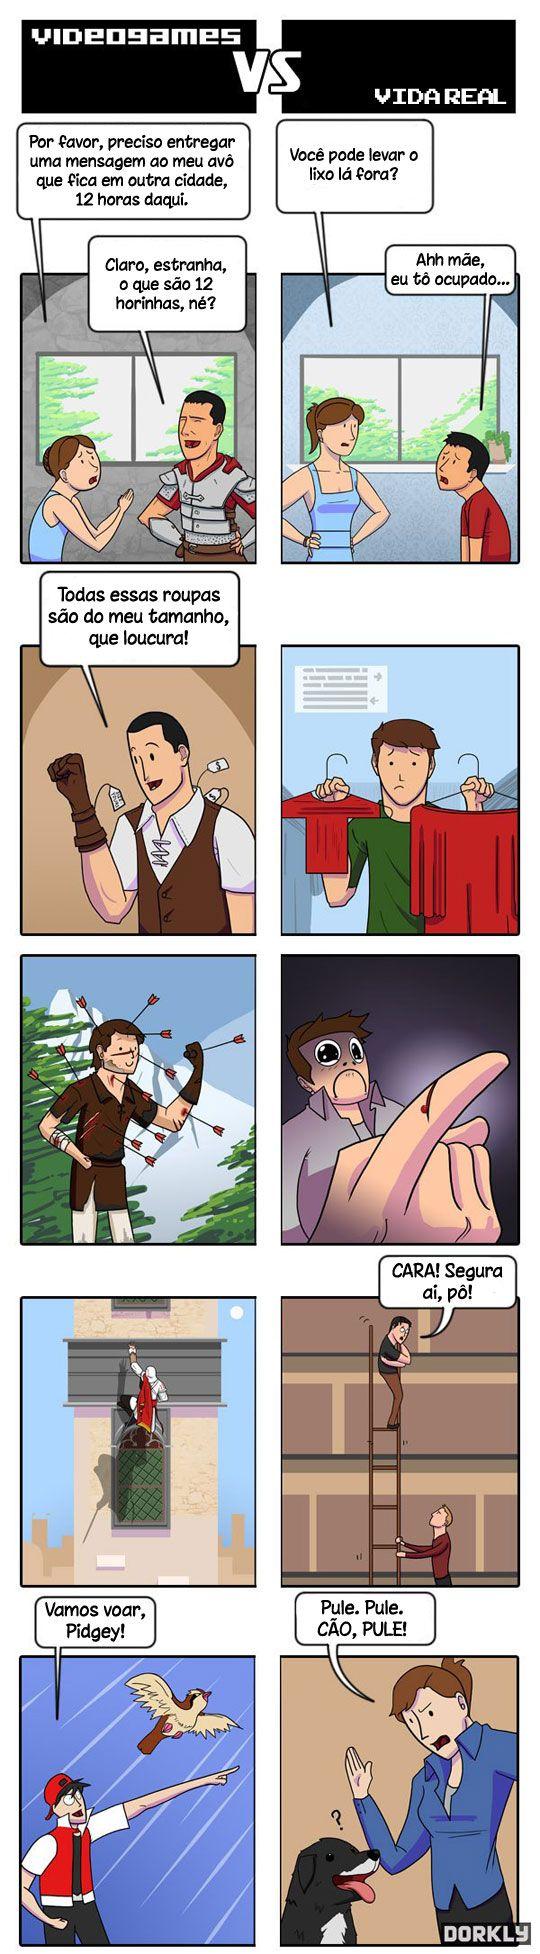 Video Games vs Vida Real